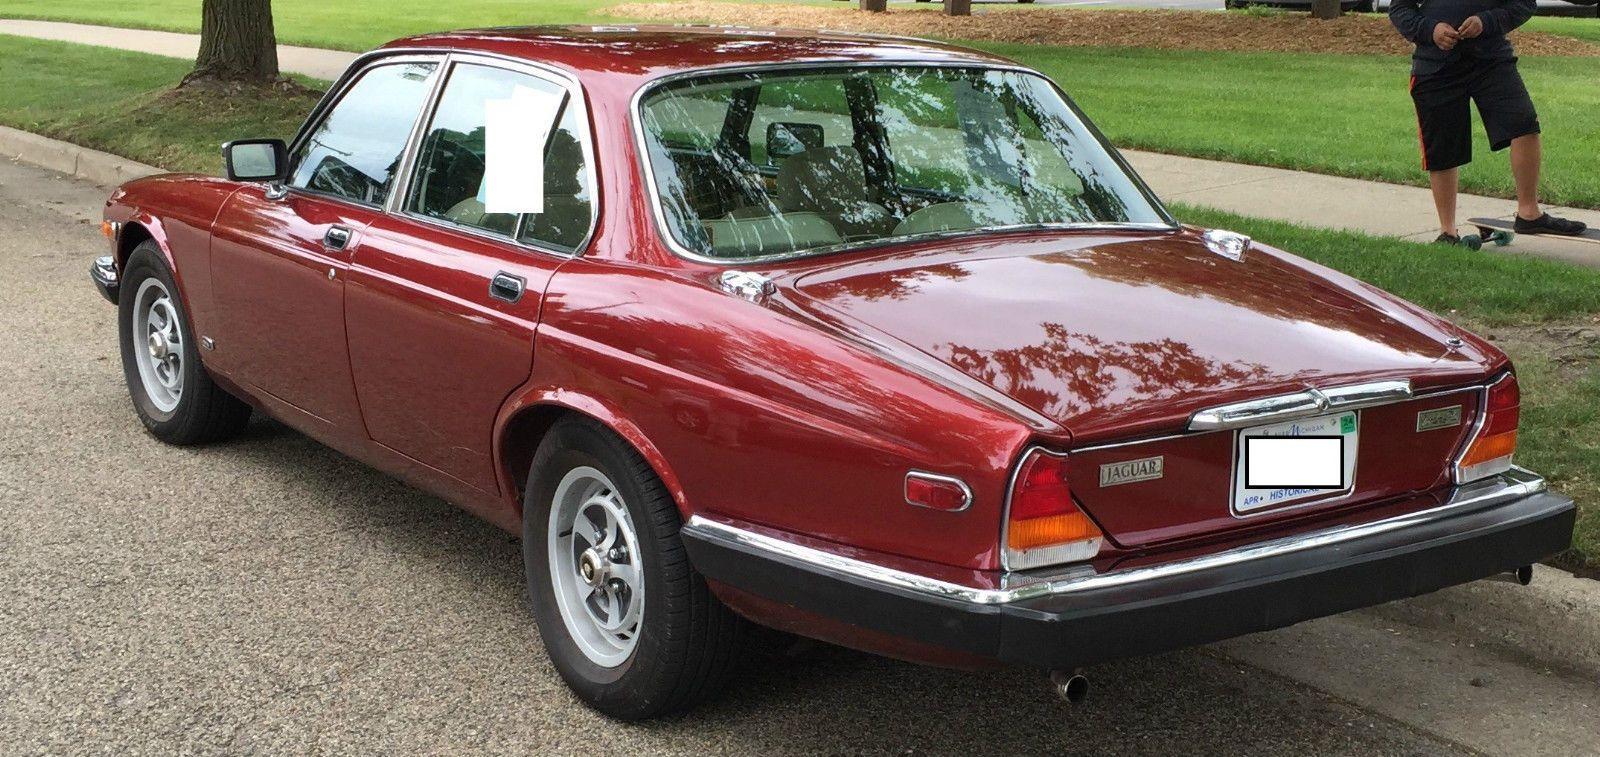 1984 Jaguar XJ Vanden Plas Sedan for sale